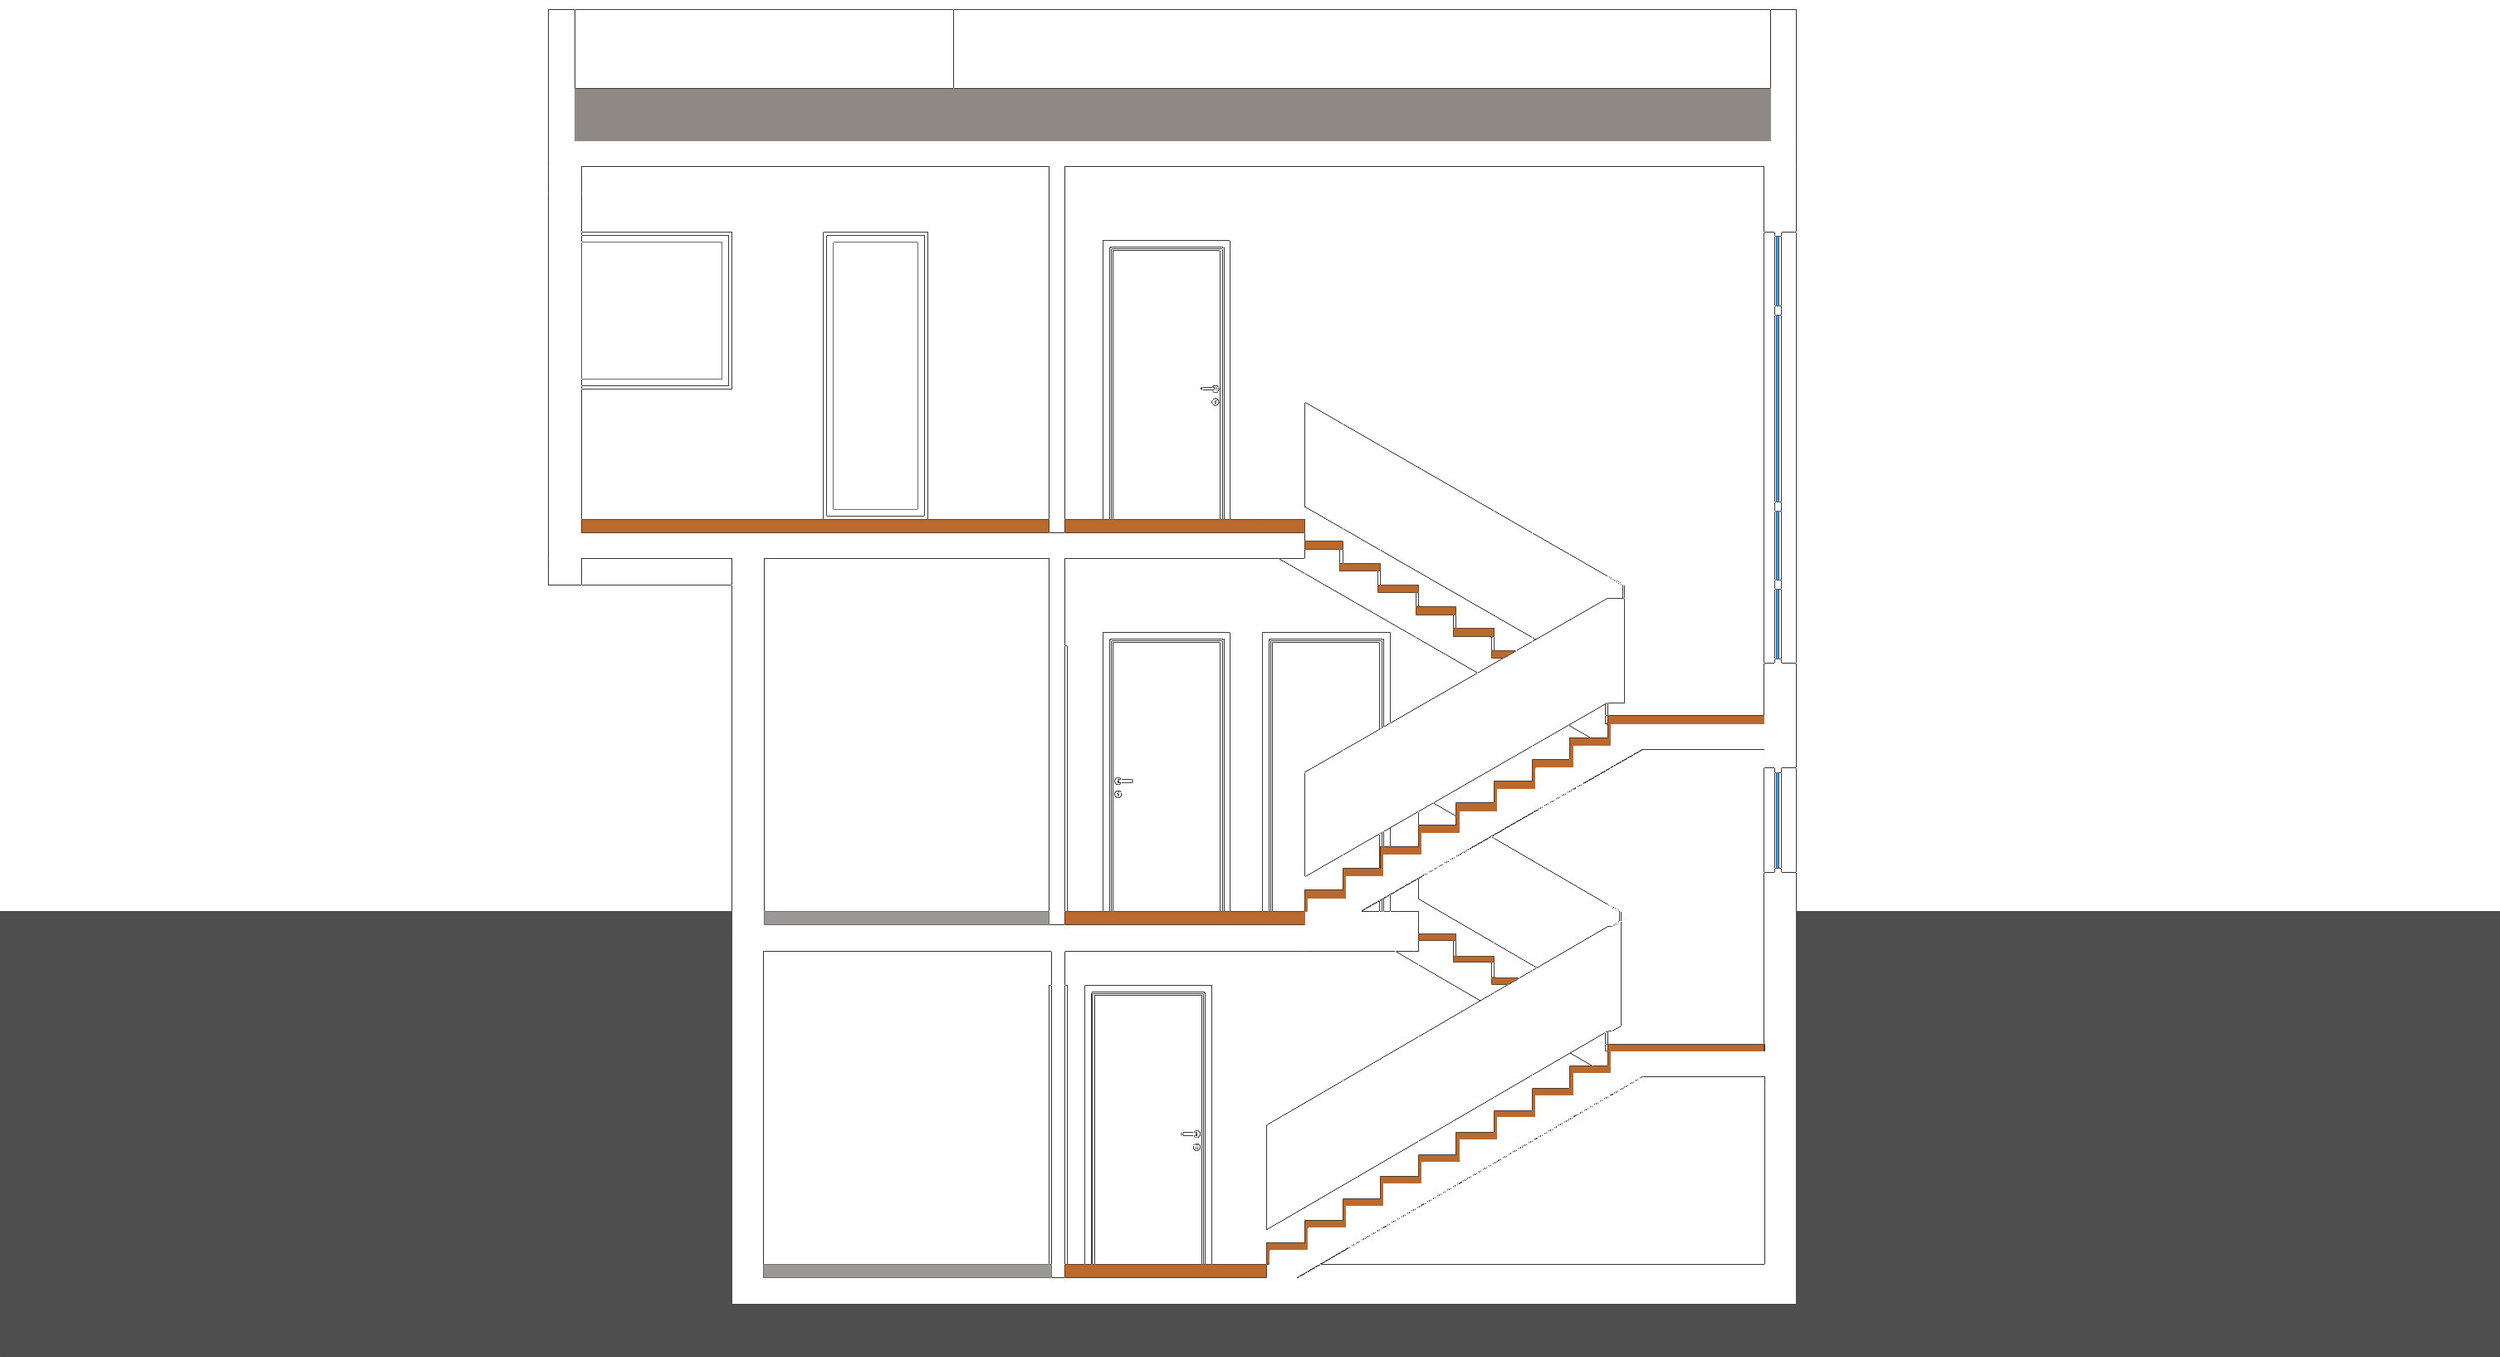 CAD Fajlli - Origjinal